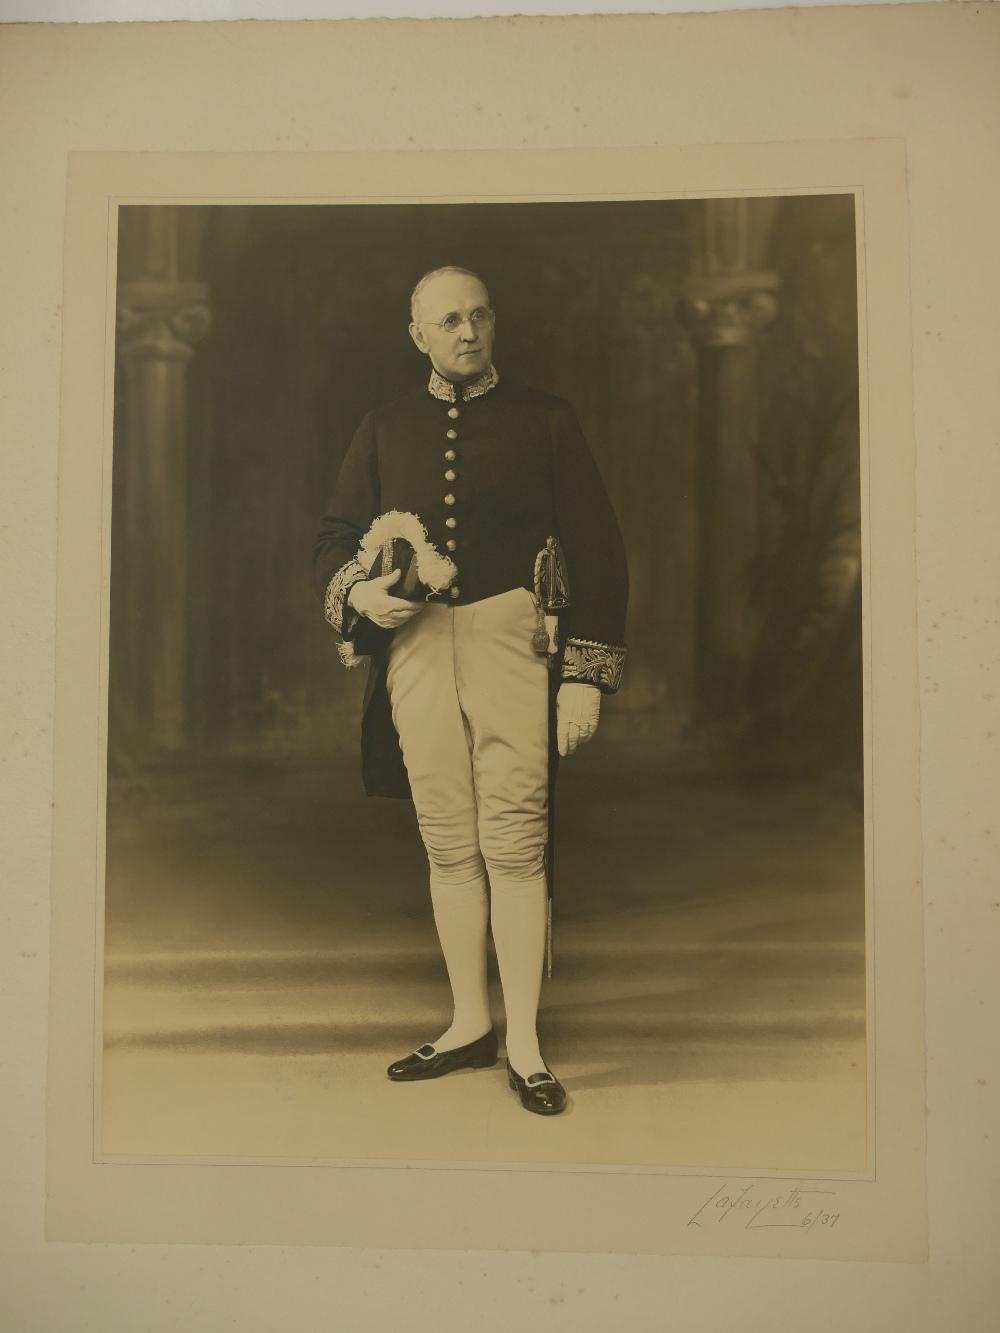 Lot 30 - Three large Lafayette studio Photographs - Sir William Keel,